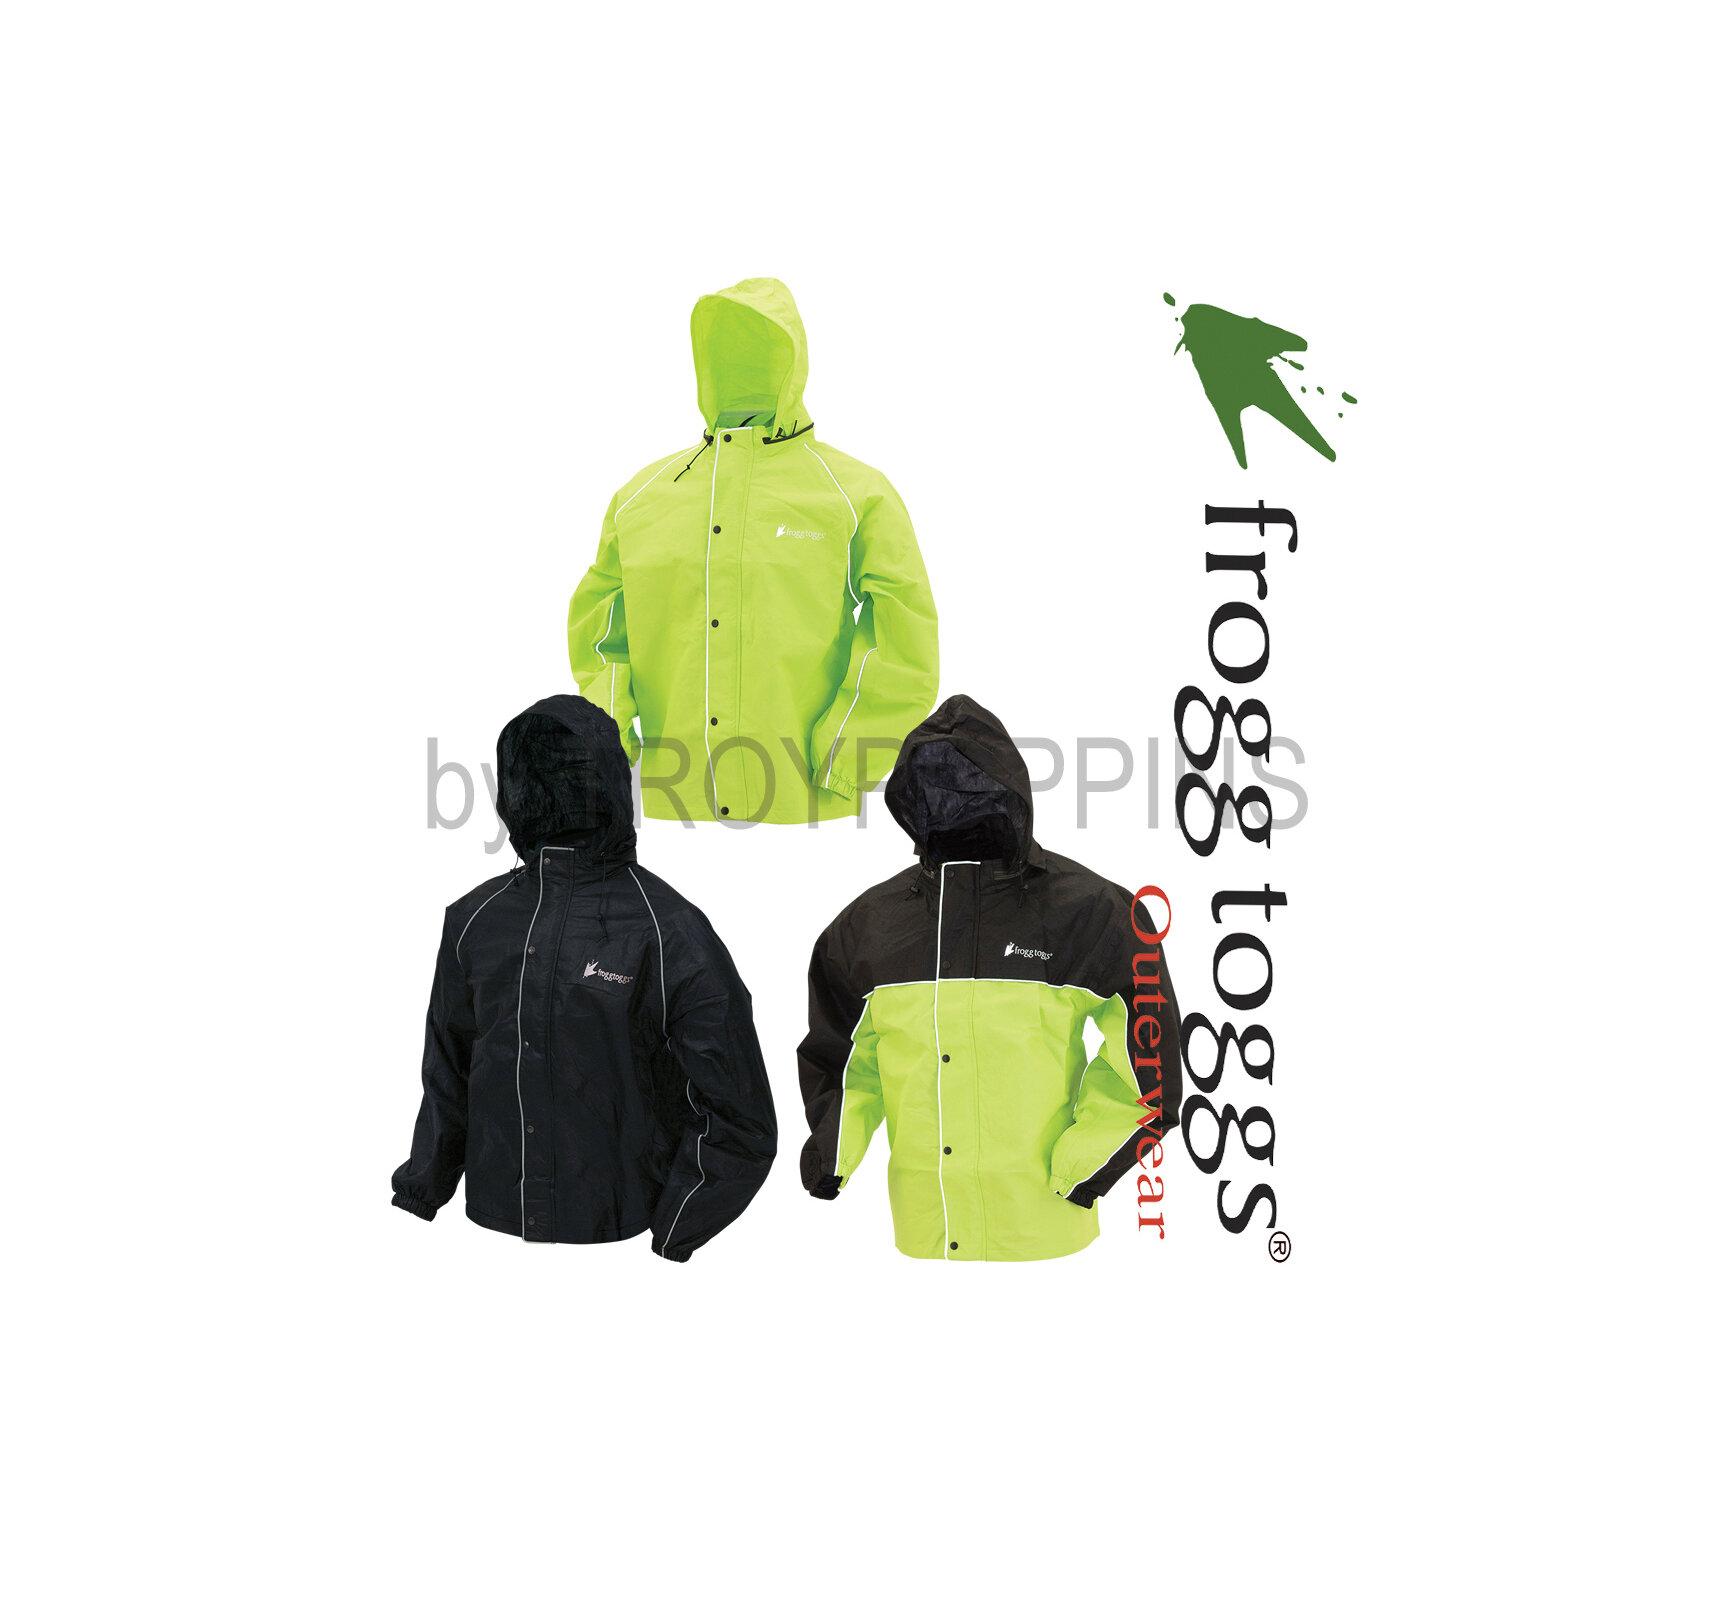 Lite Unisex Dark Green Rain Poncho Frogg Toggs Ultra